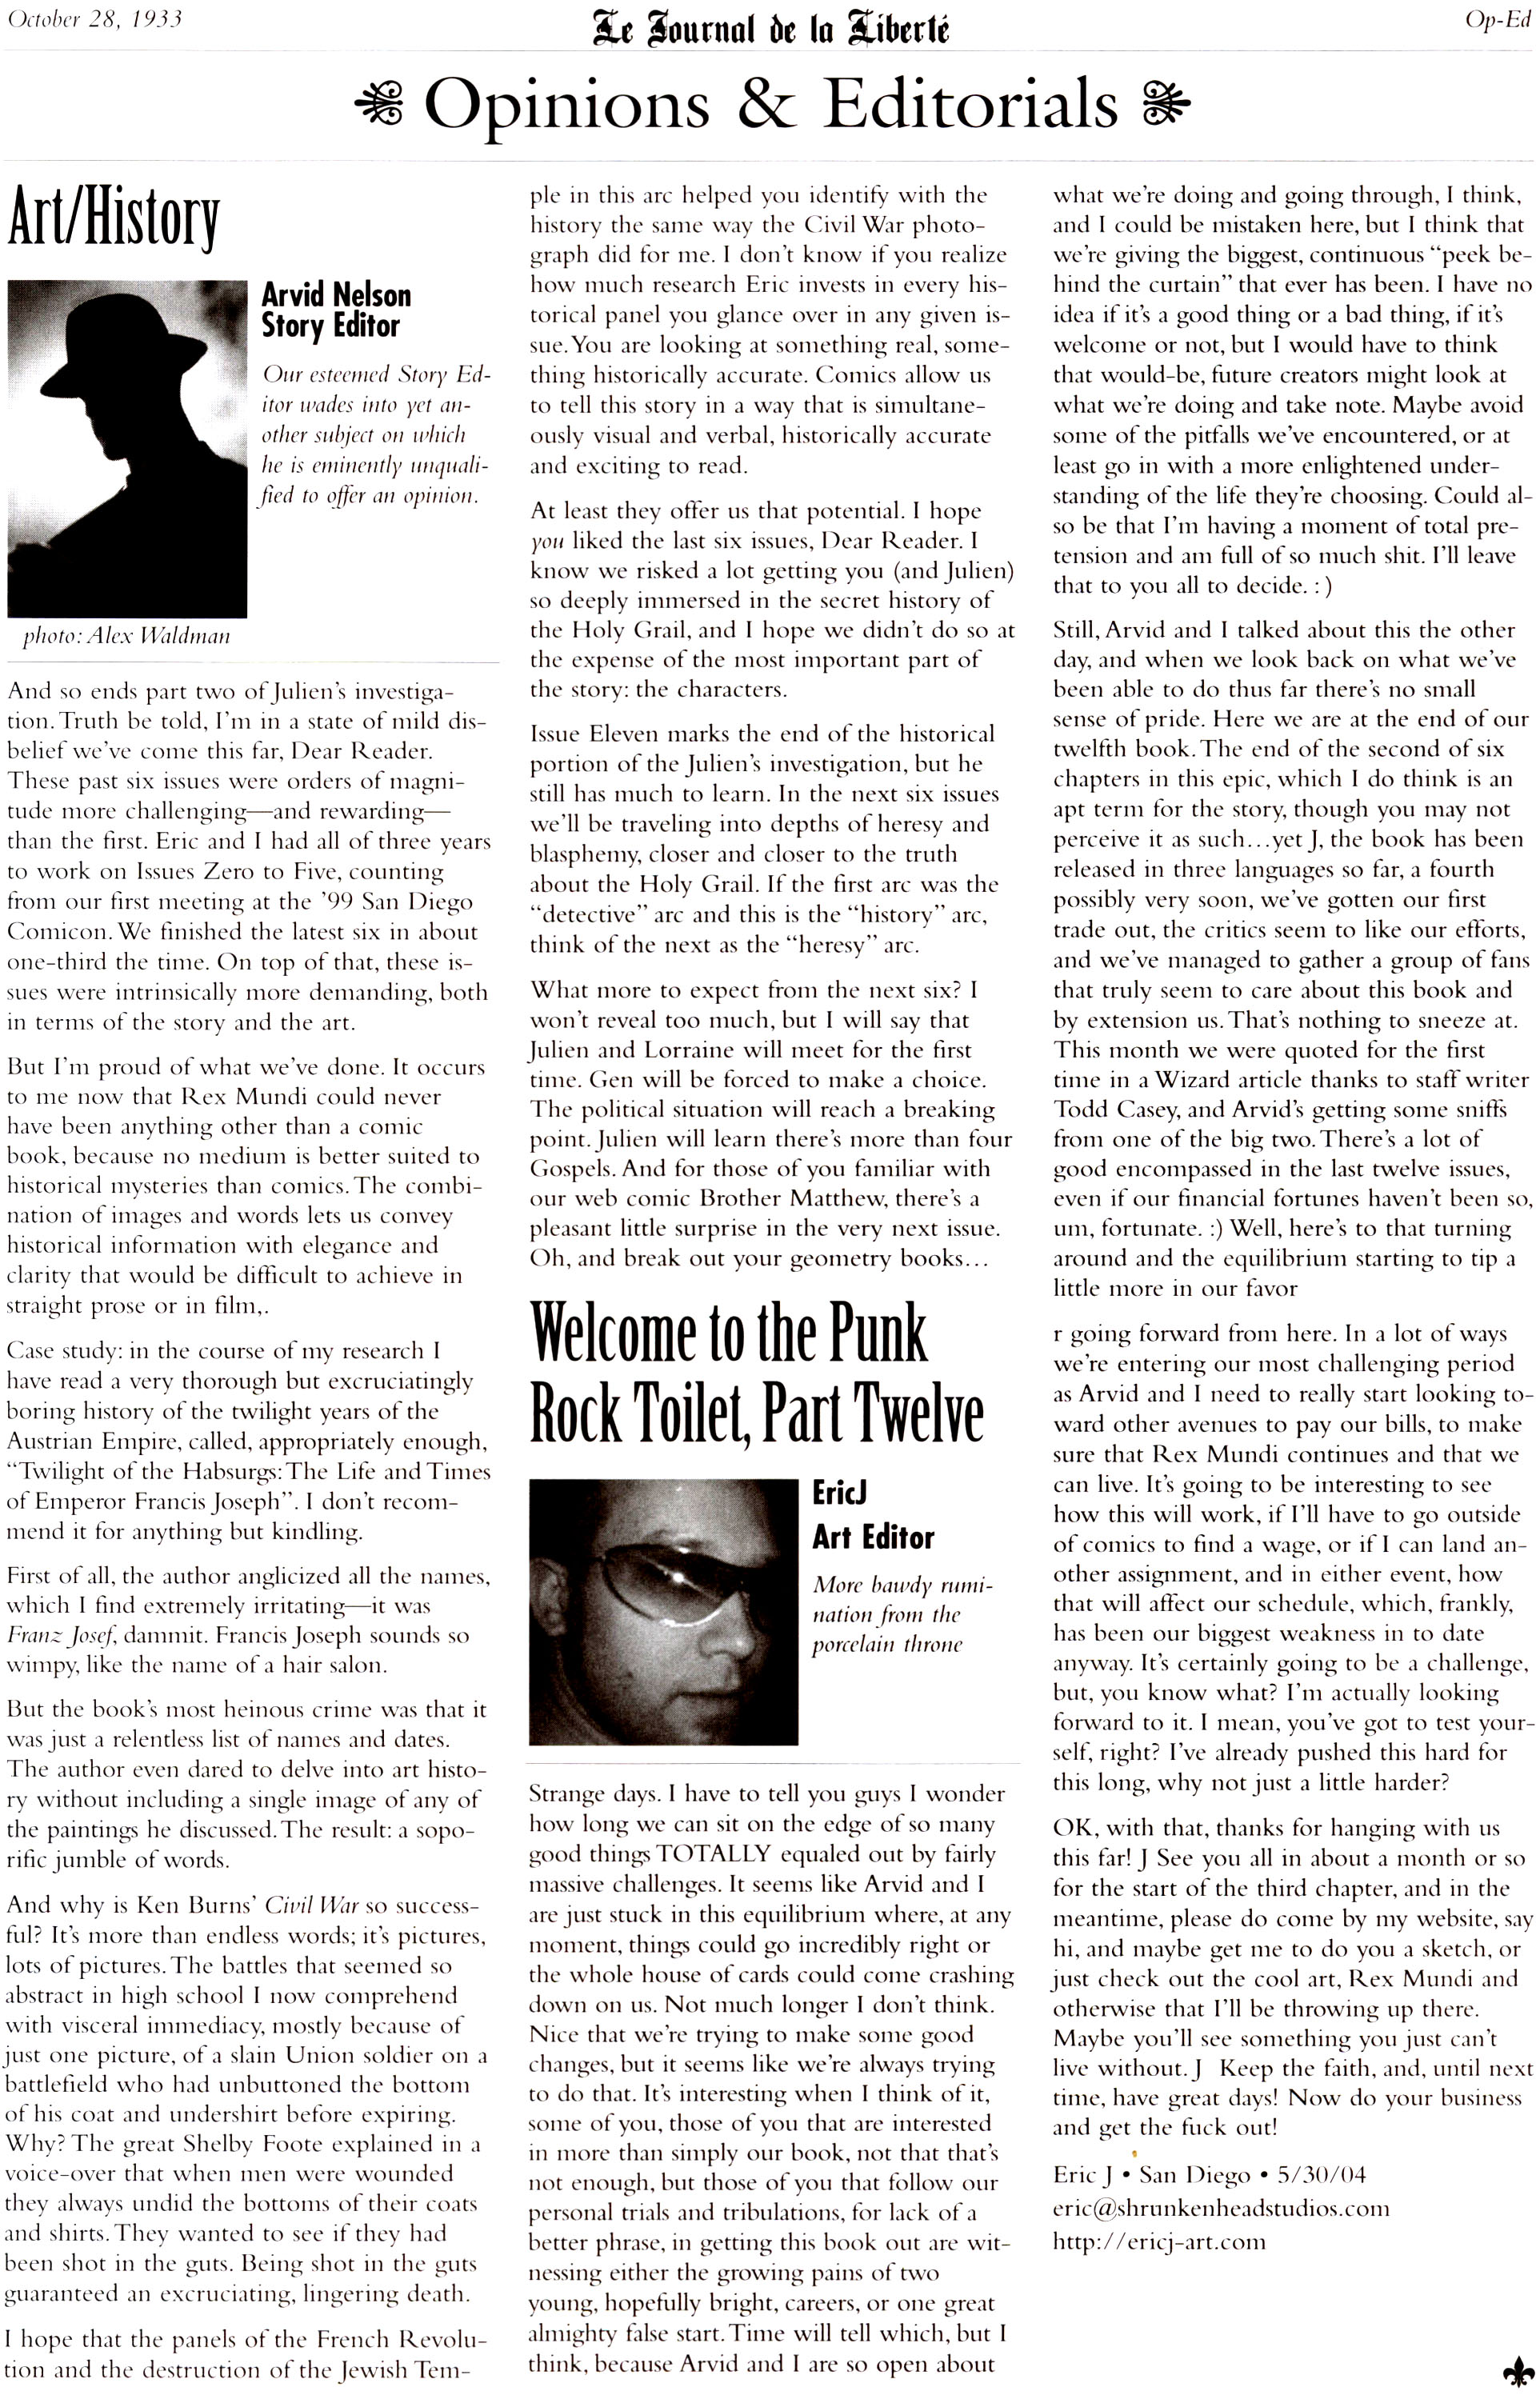 Read online Rex Mundi comic -  Issue #11 - 29